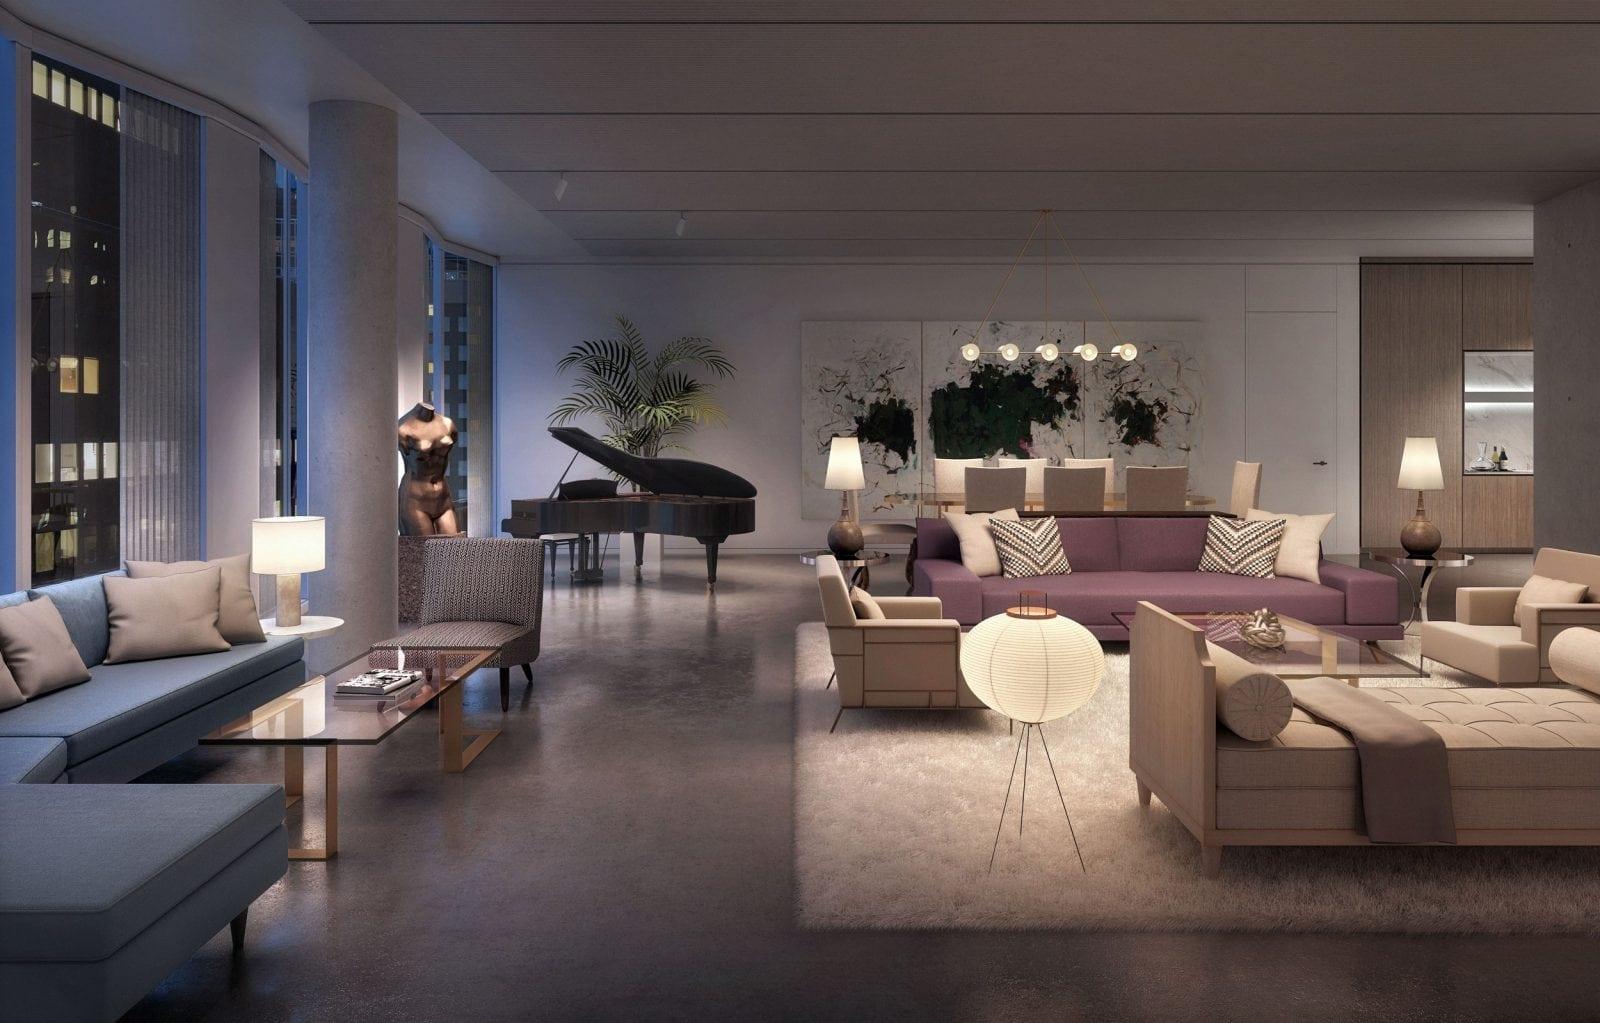 ce3270dc 54c0 4c40 bf81 260b63fe43f7 - Noul apartament al lui Amal și George Clooney